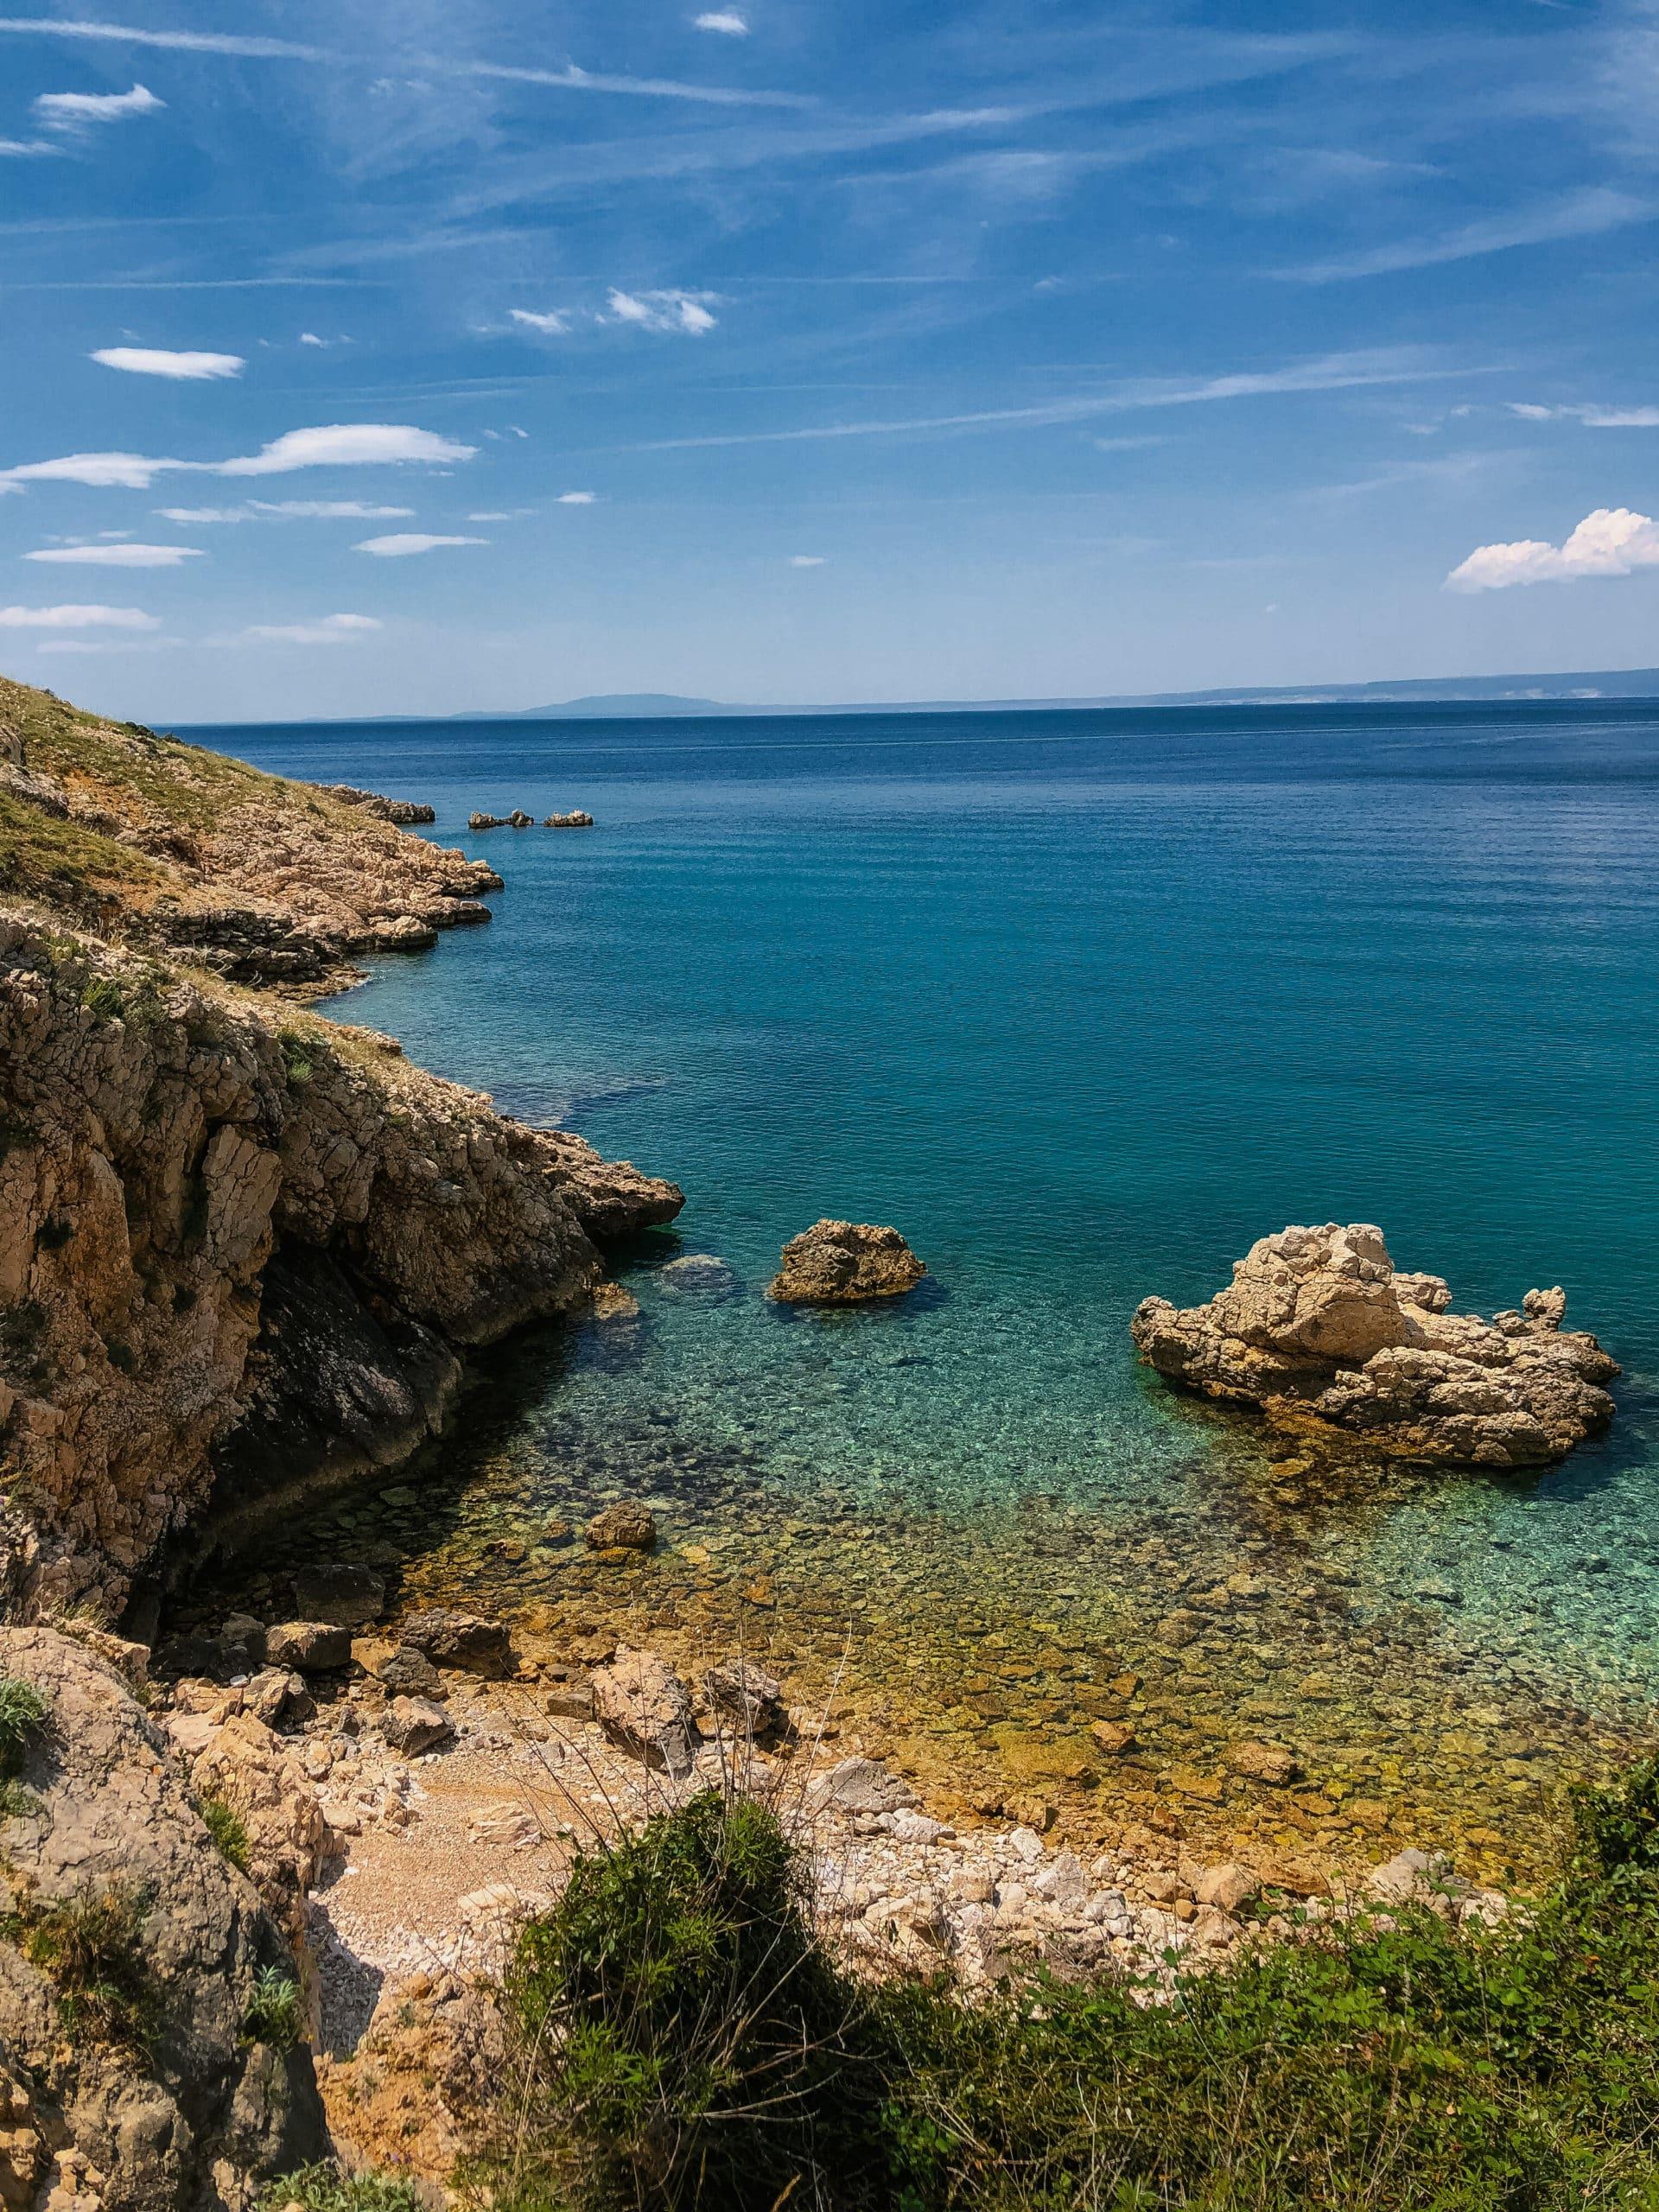 Finding hidden beaches on RAB